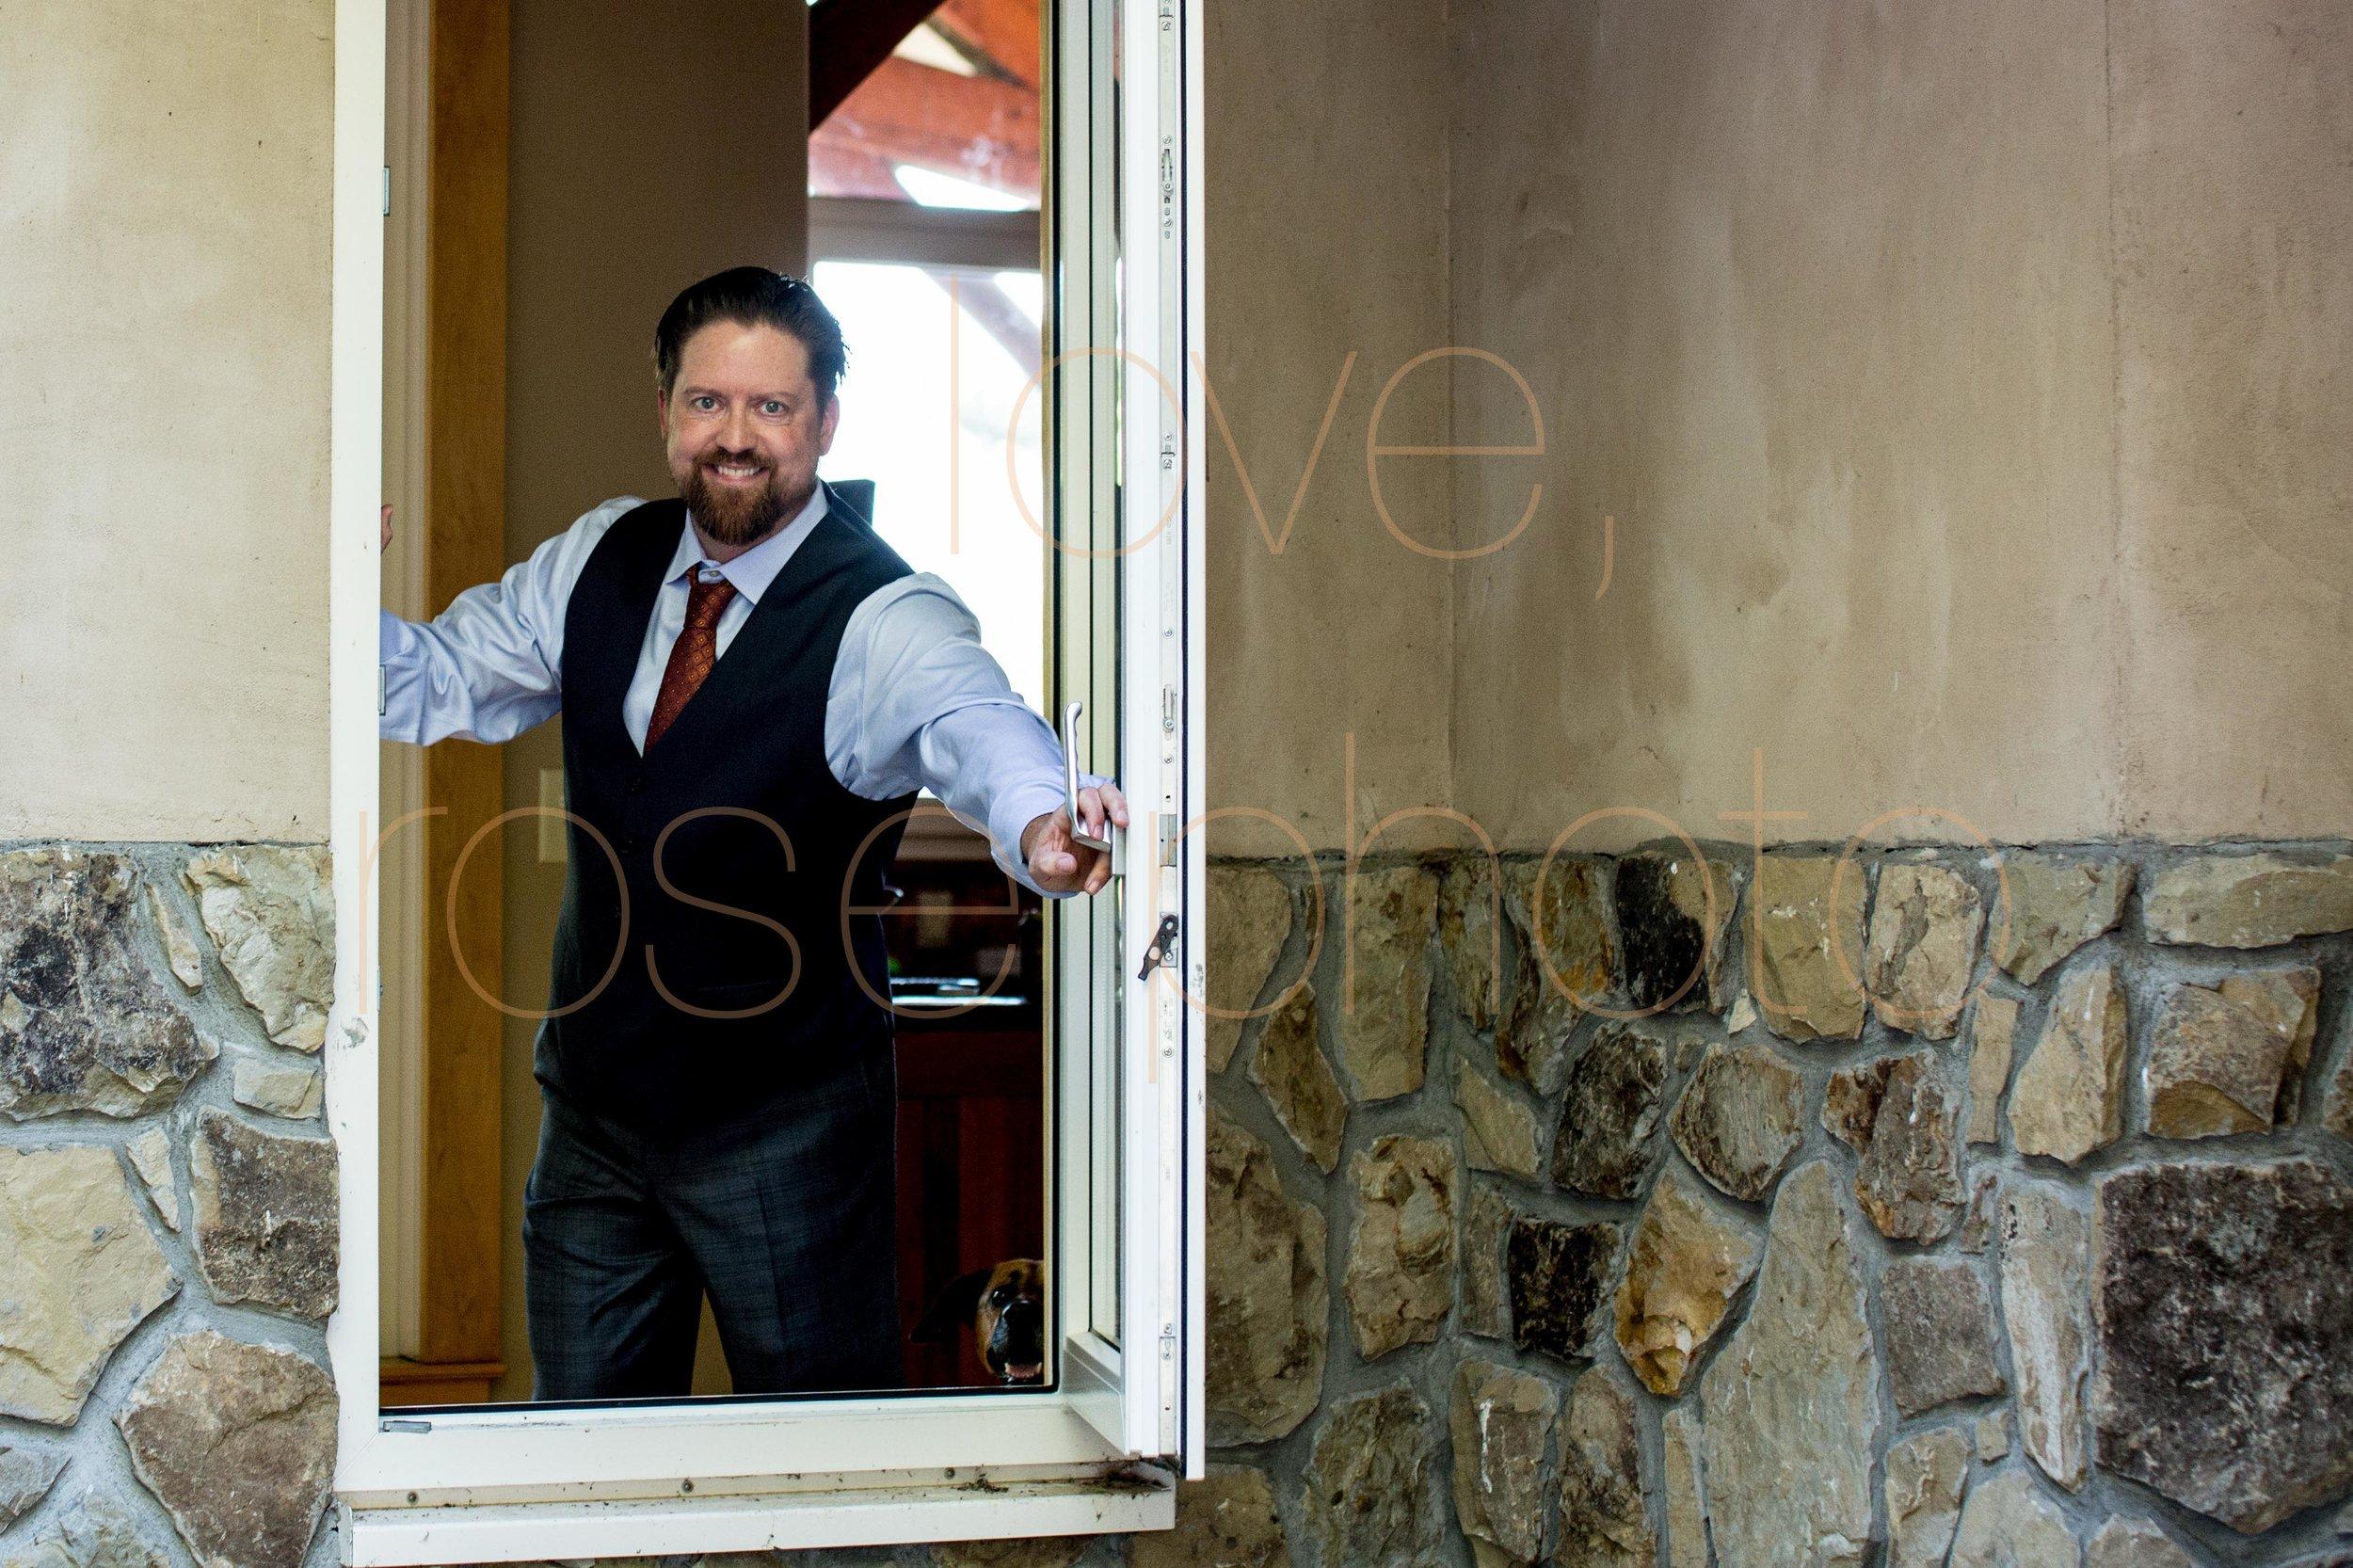 Jane Krame + Jason Ashevegas married asheville best wedding photographers -9.jpg